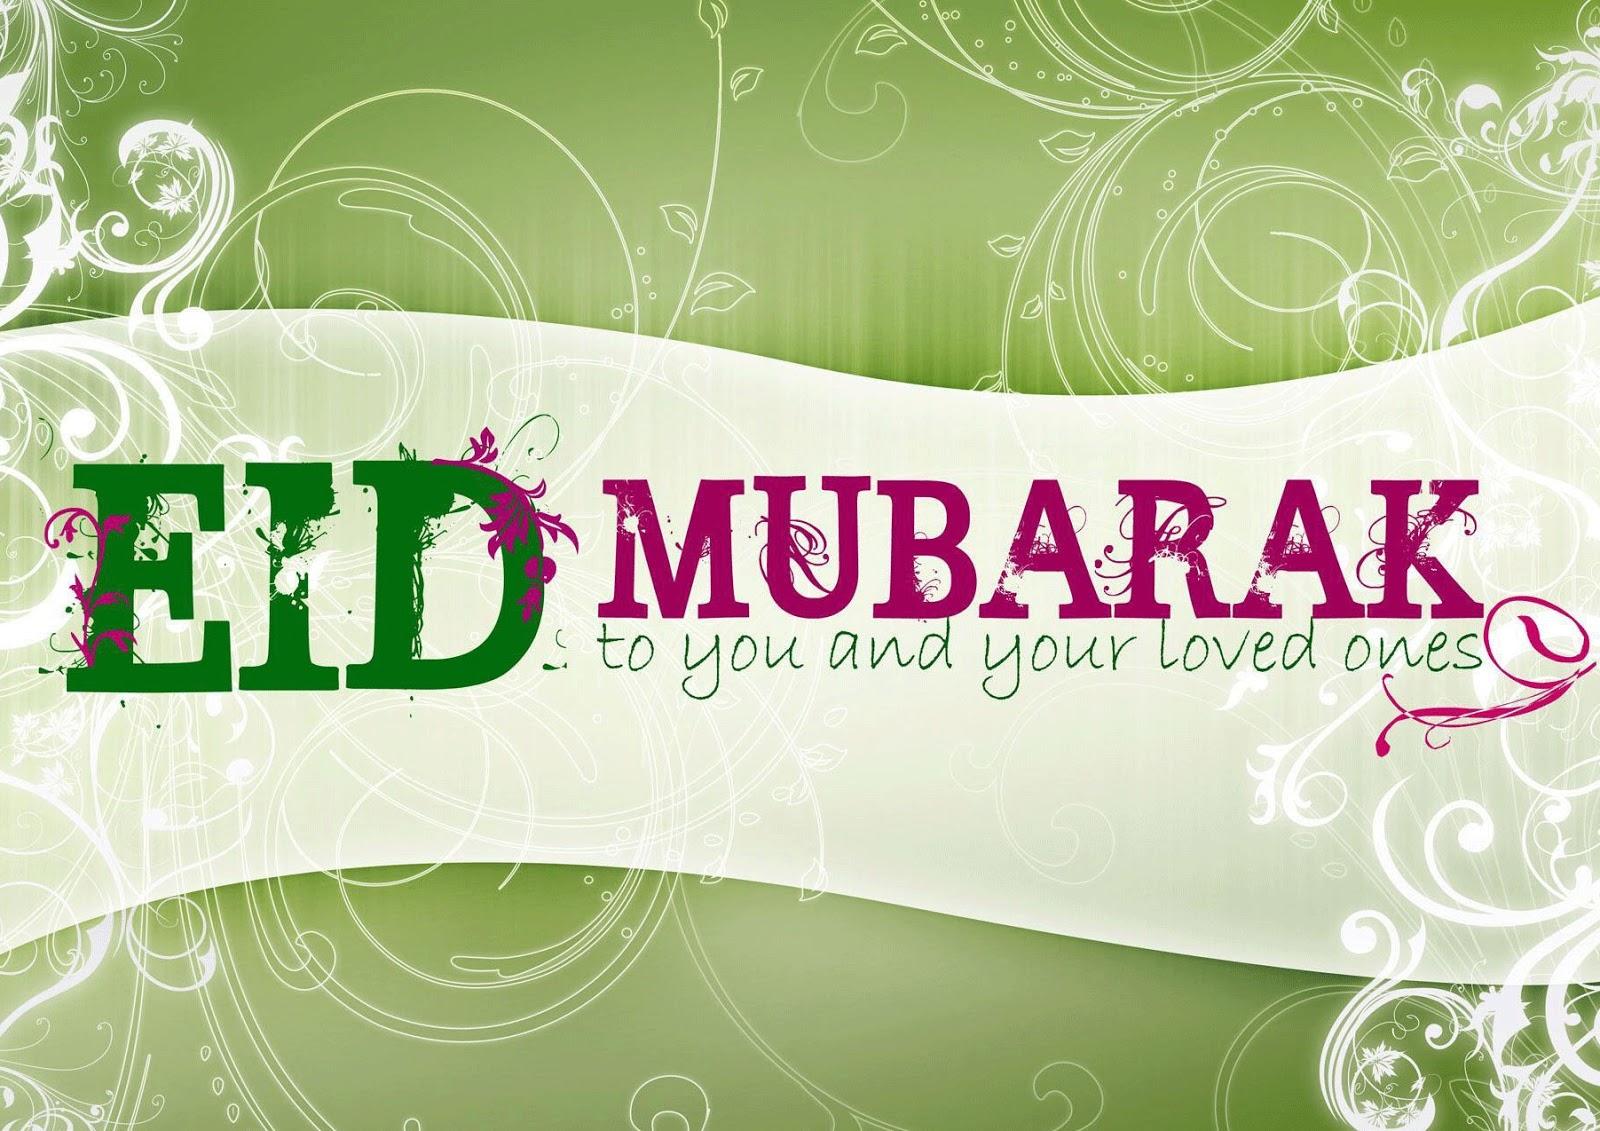 Top 10 Eid Mubarak Images Free Download 2017 Eid Mubarak Pictures